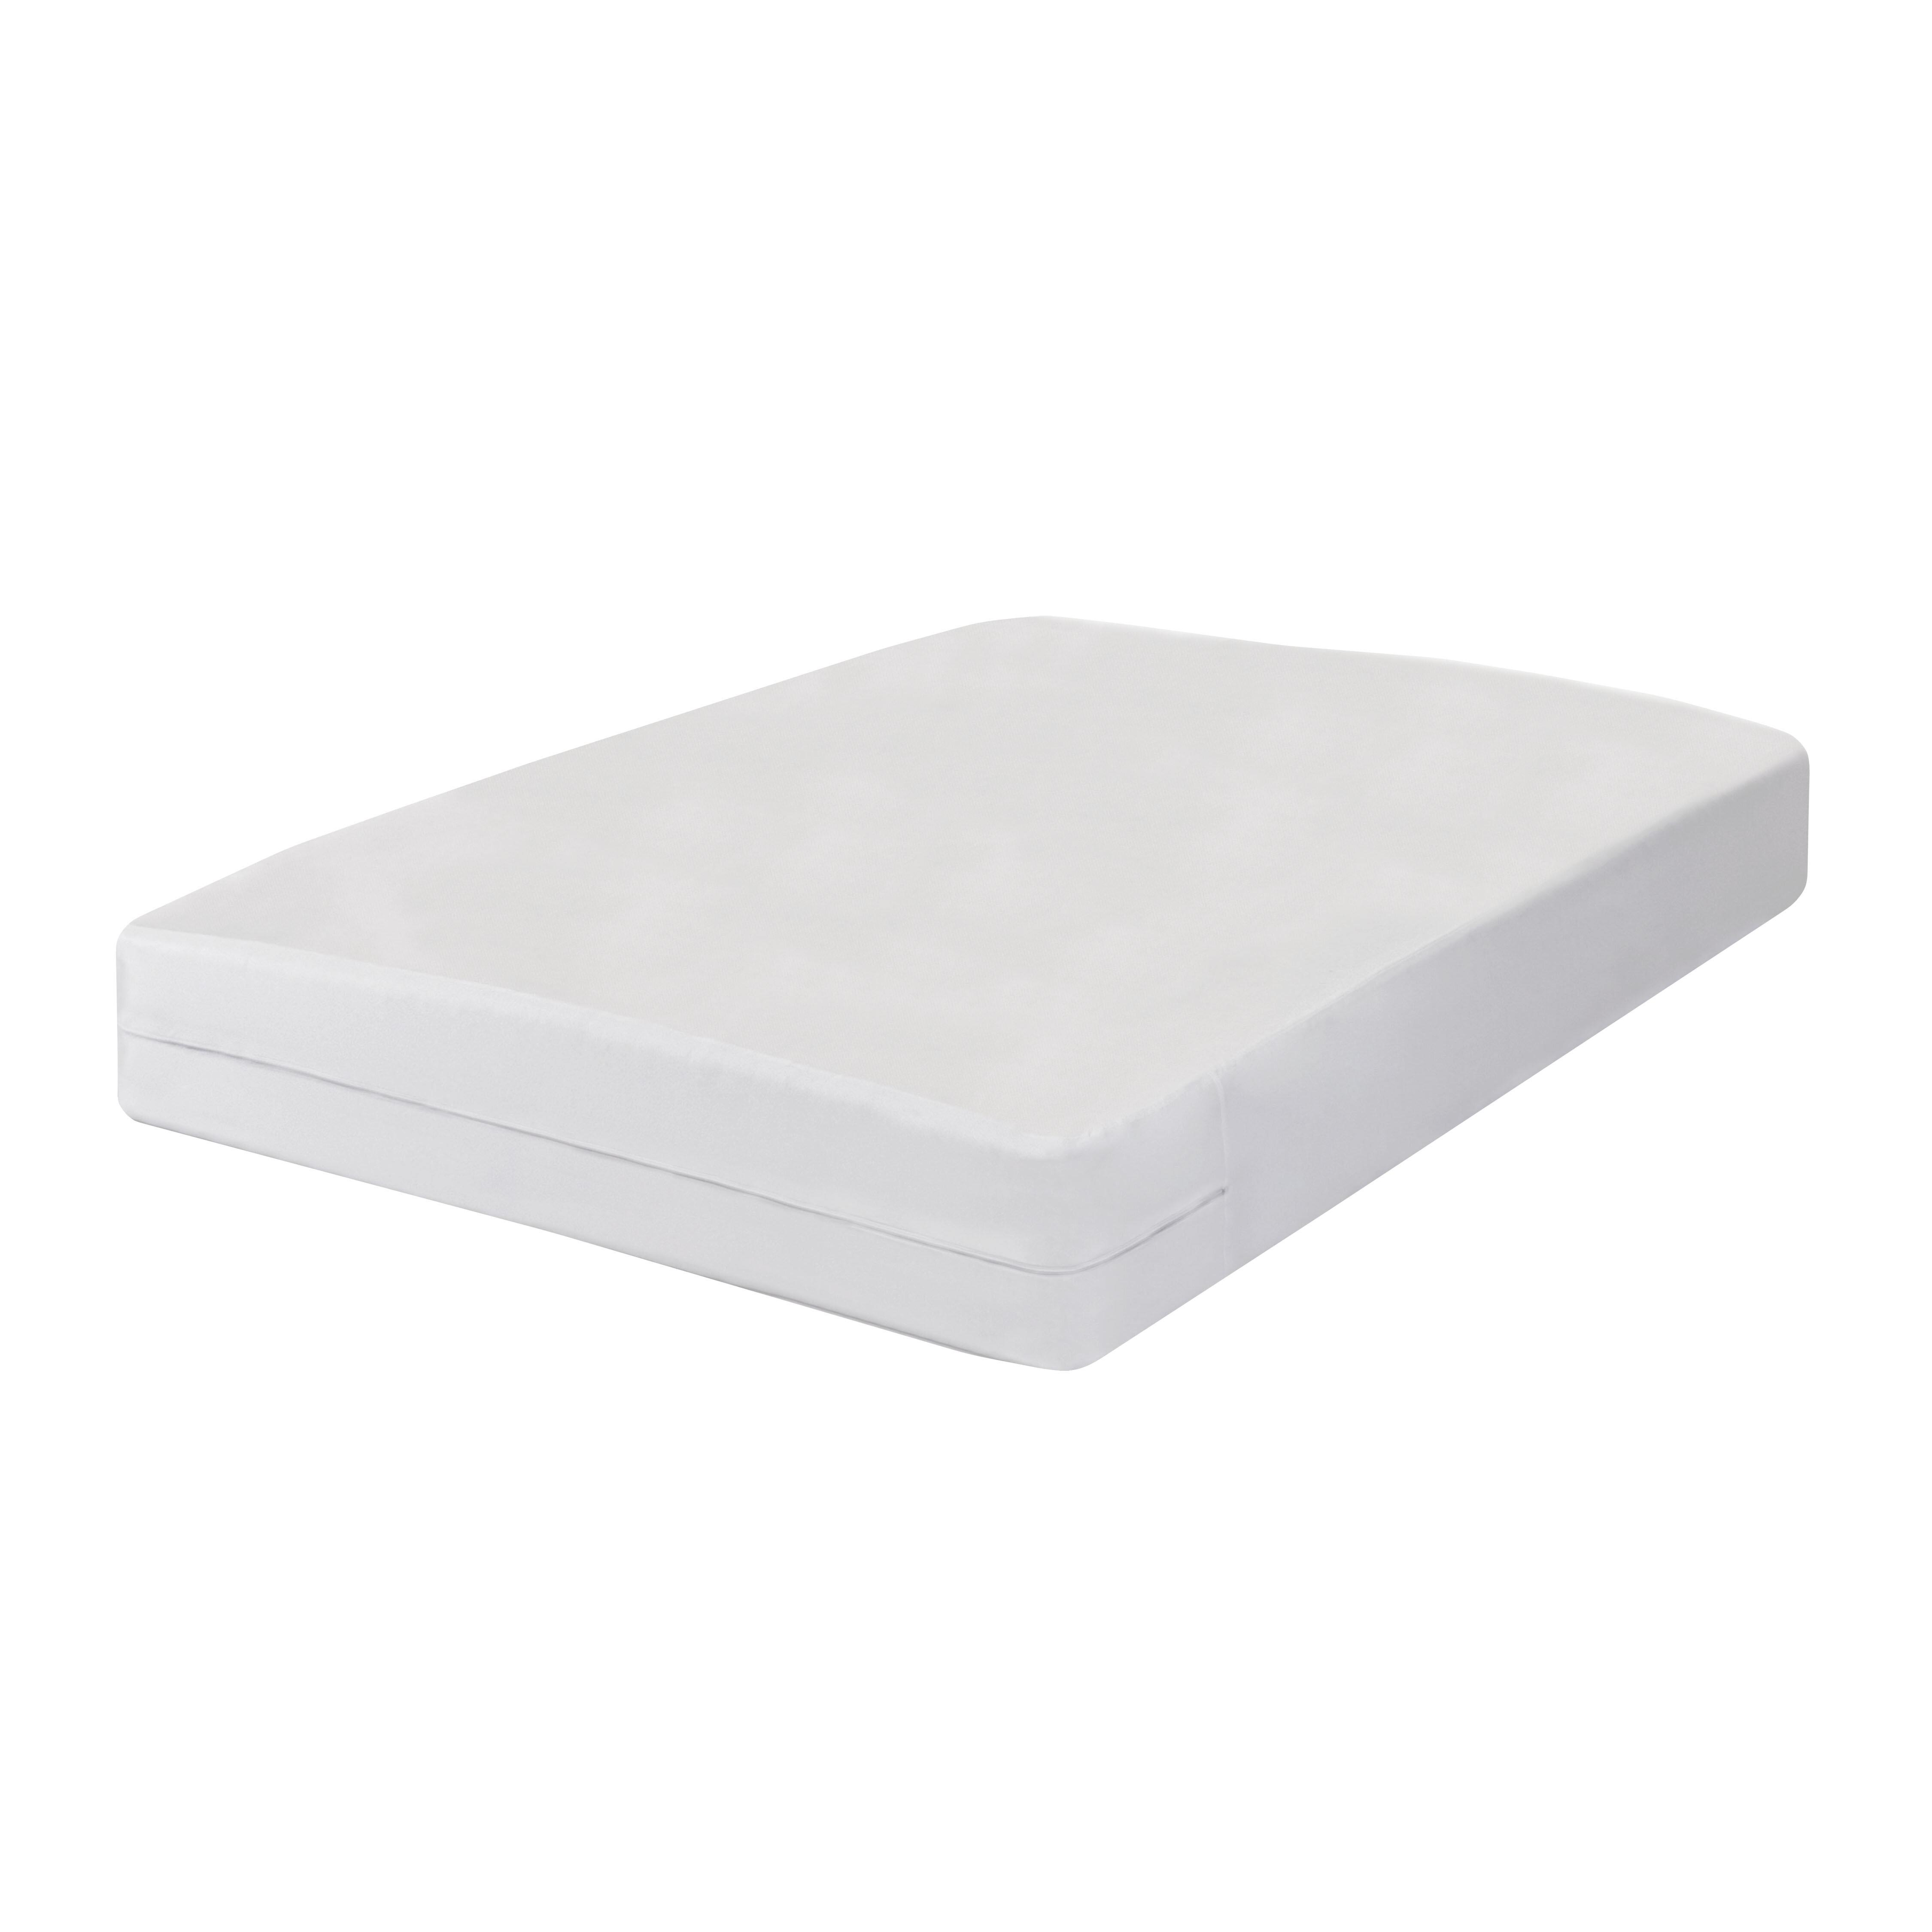 fresh ideas all-in-one bed bug blocker non-woven box spring